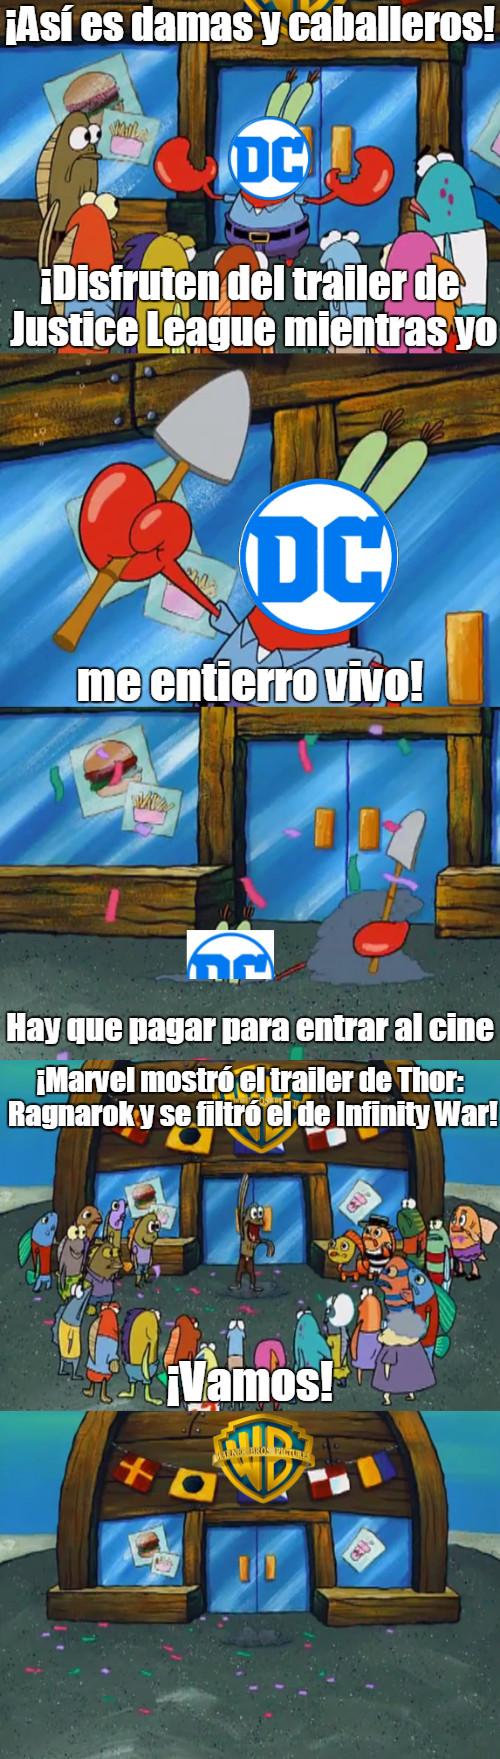 Meme_otros - Marvel arruinando la fiesta de DC